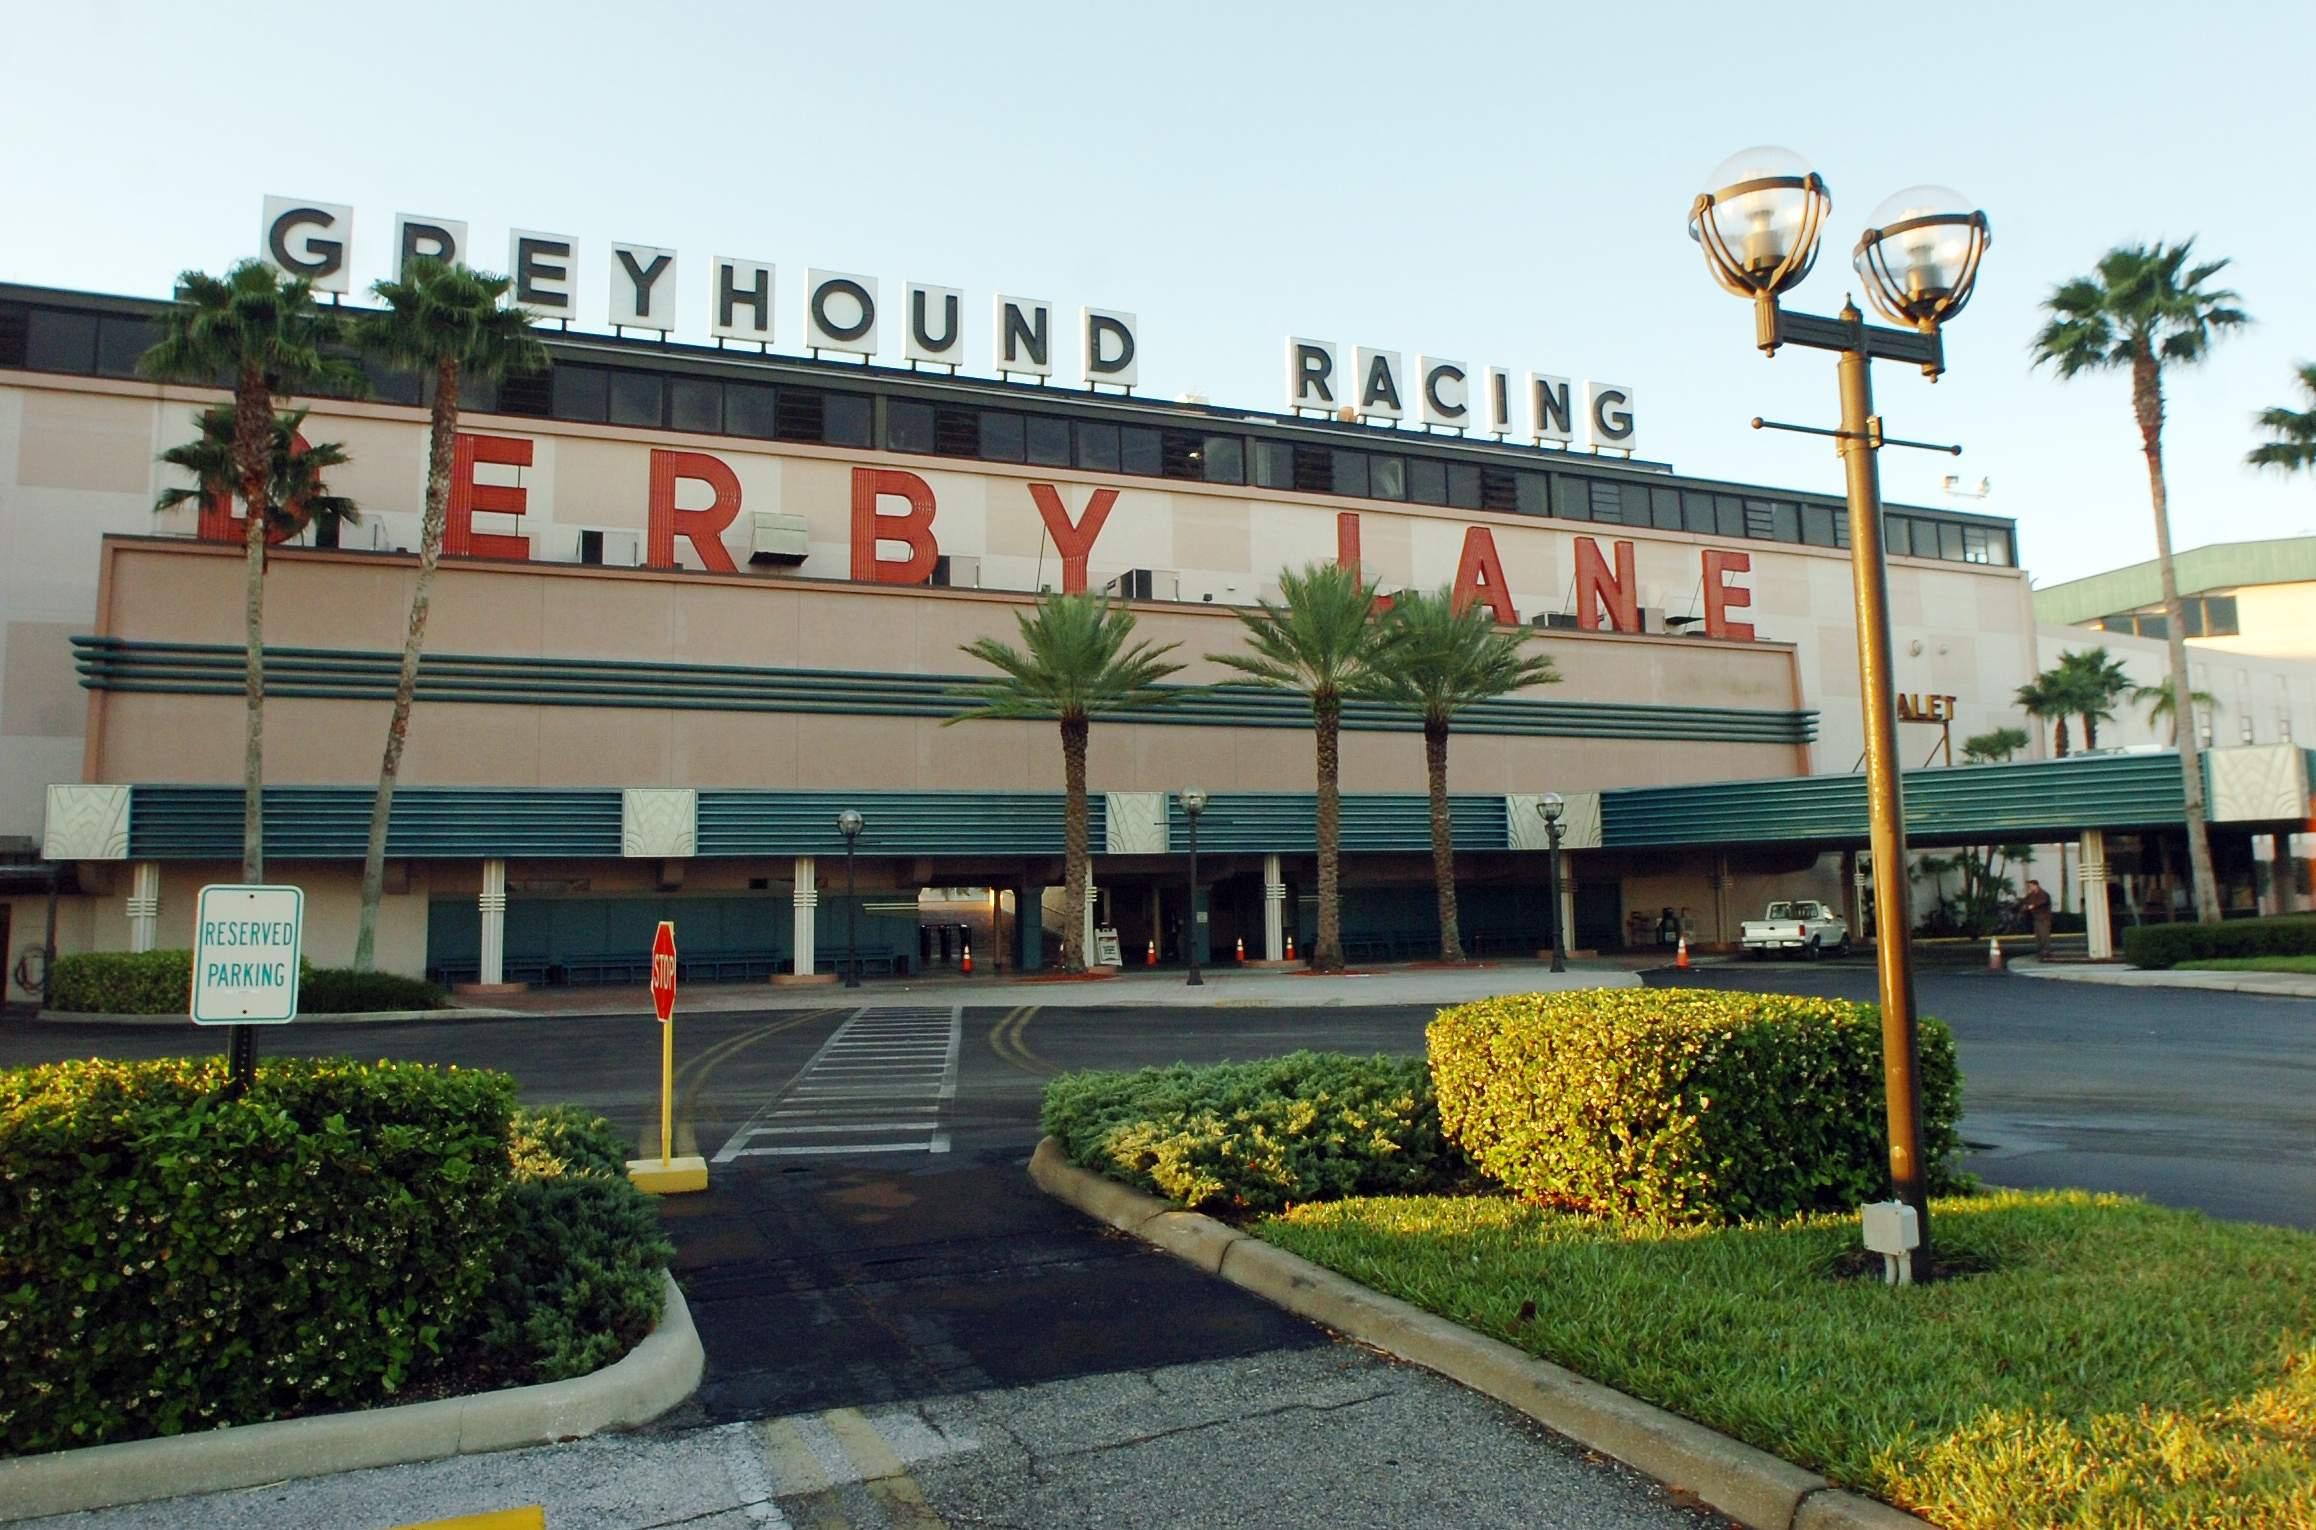 derby-lane Rays